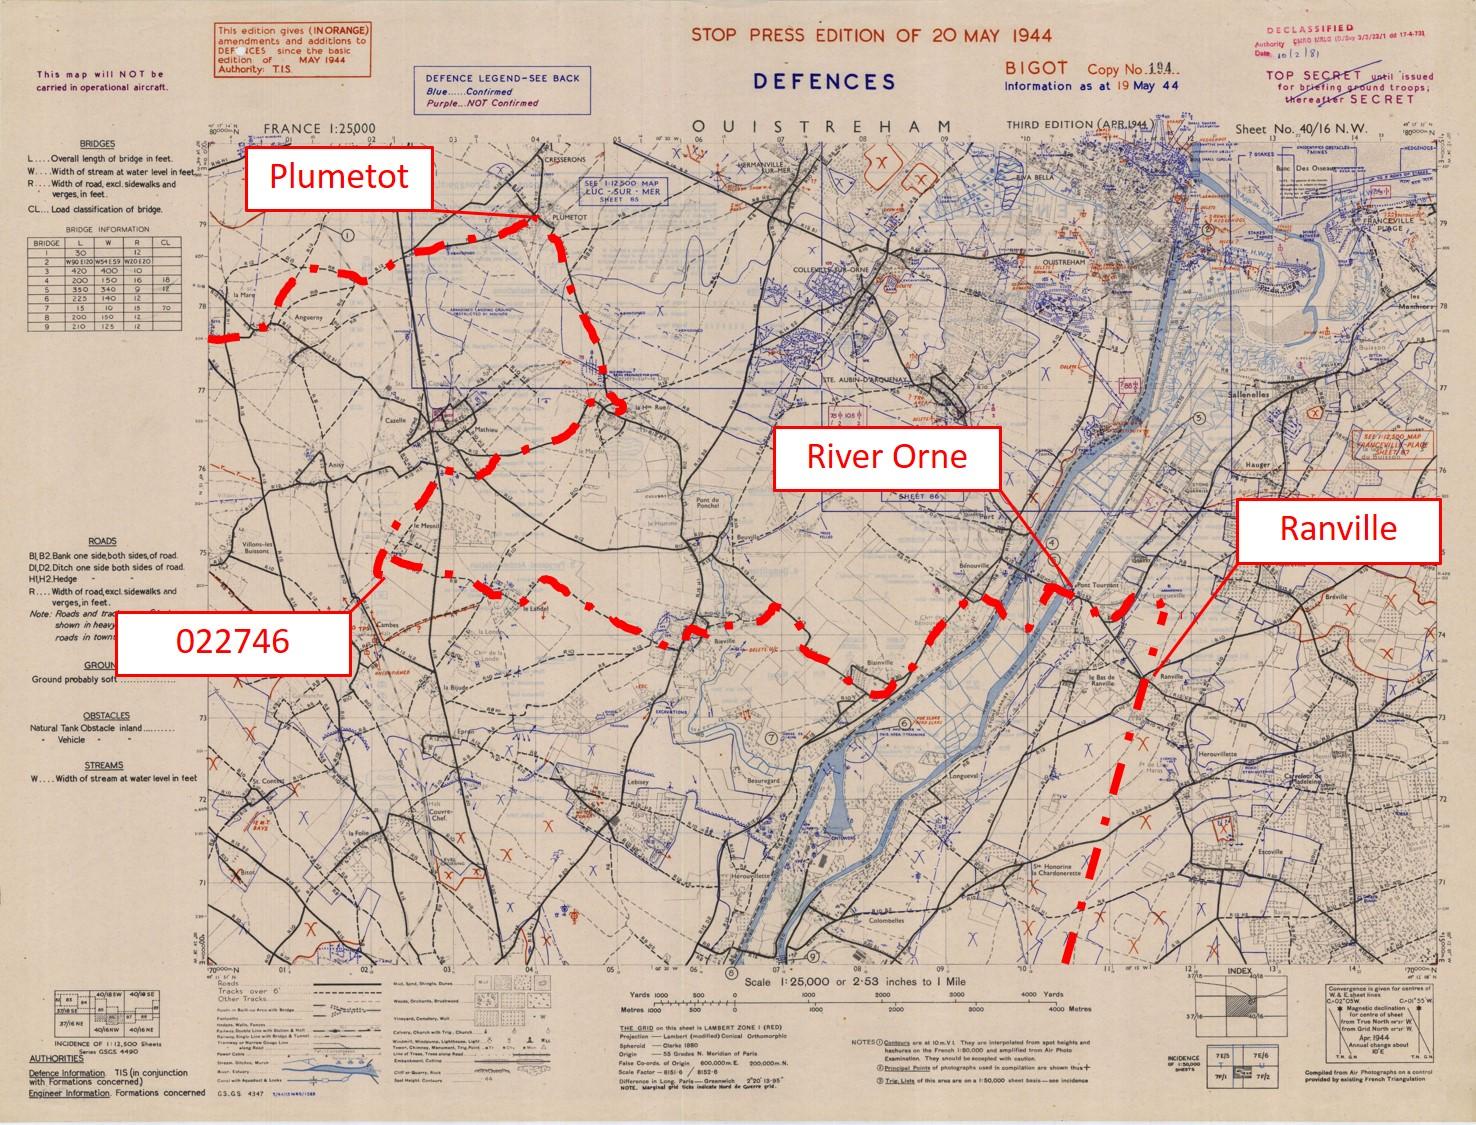 006B - GSGS-4347-Ouistreham-route